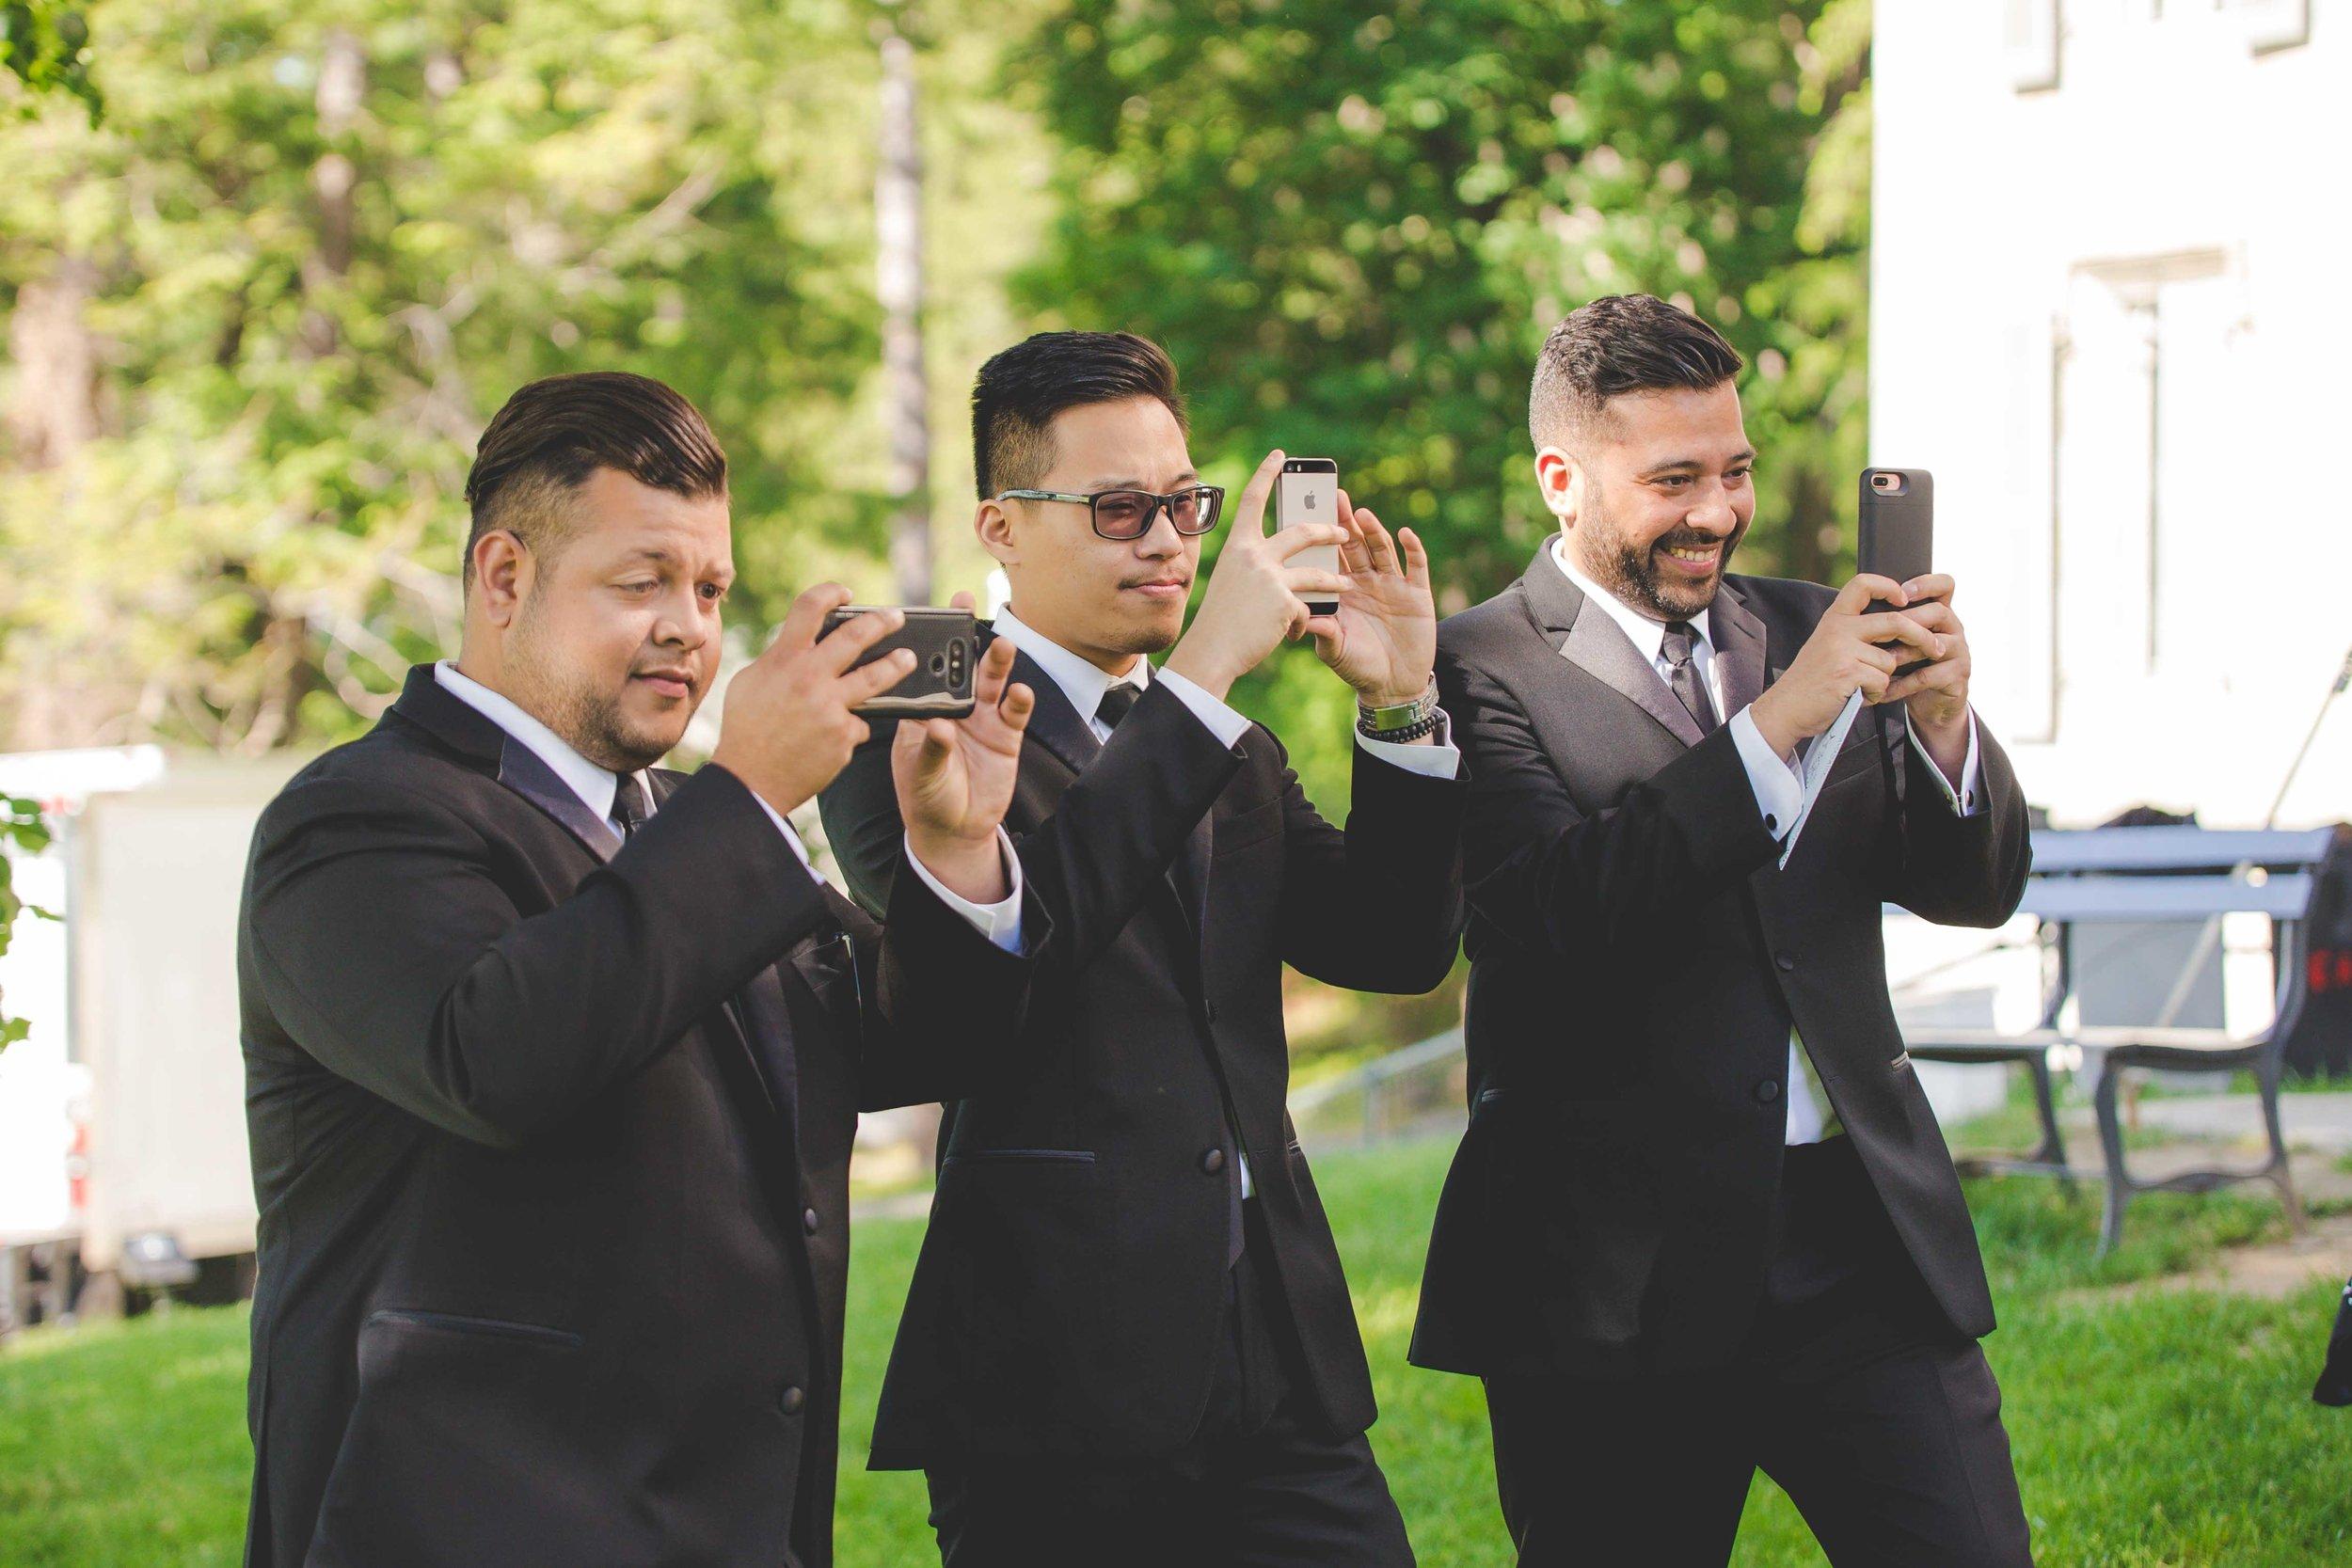 lyndhurst-mansion-amazing-gay-wedding-8.jpg